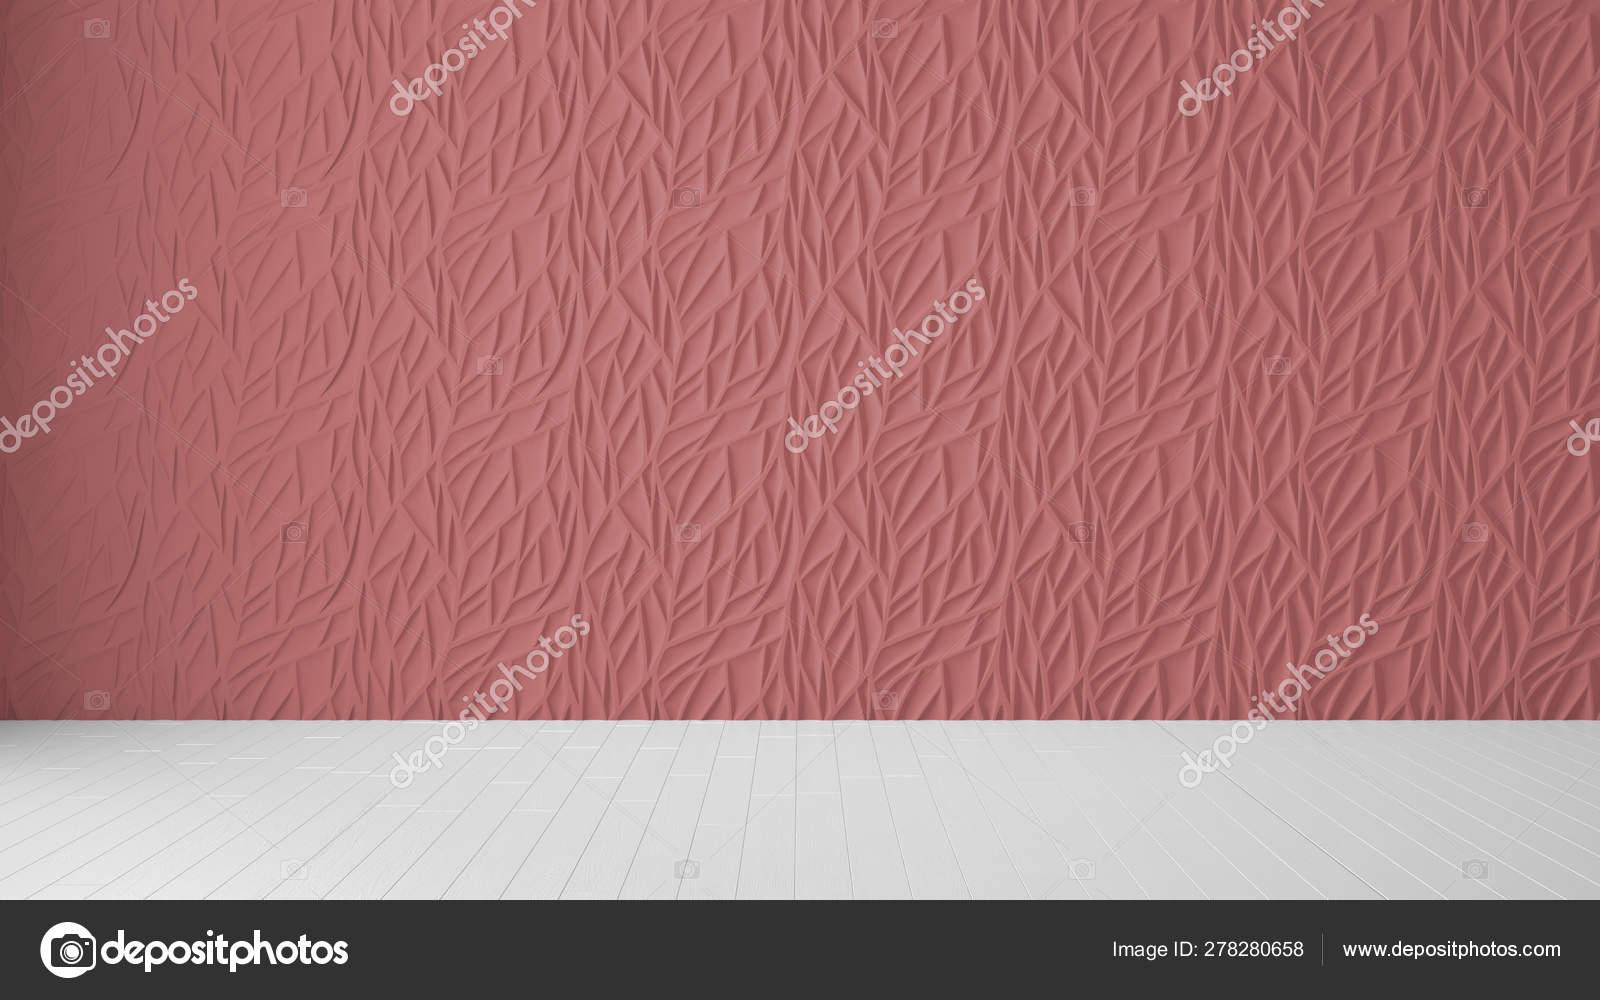 Empty room interior design, red panel and wooden blank floor